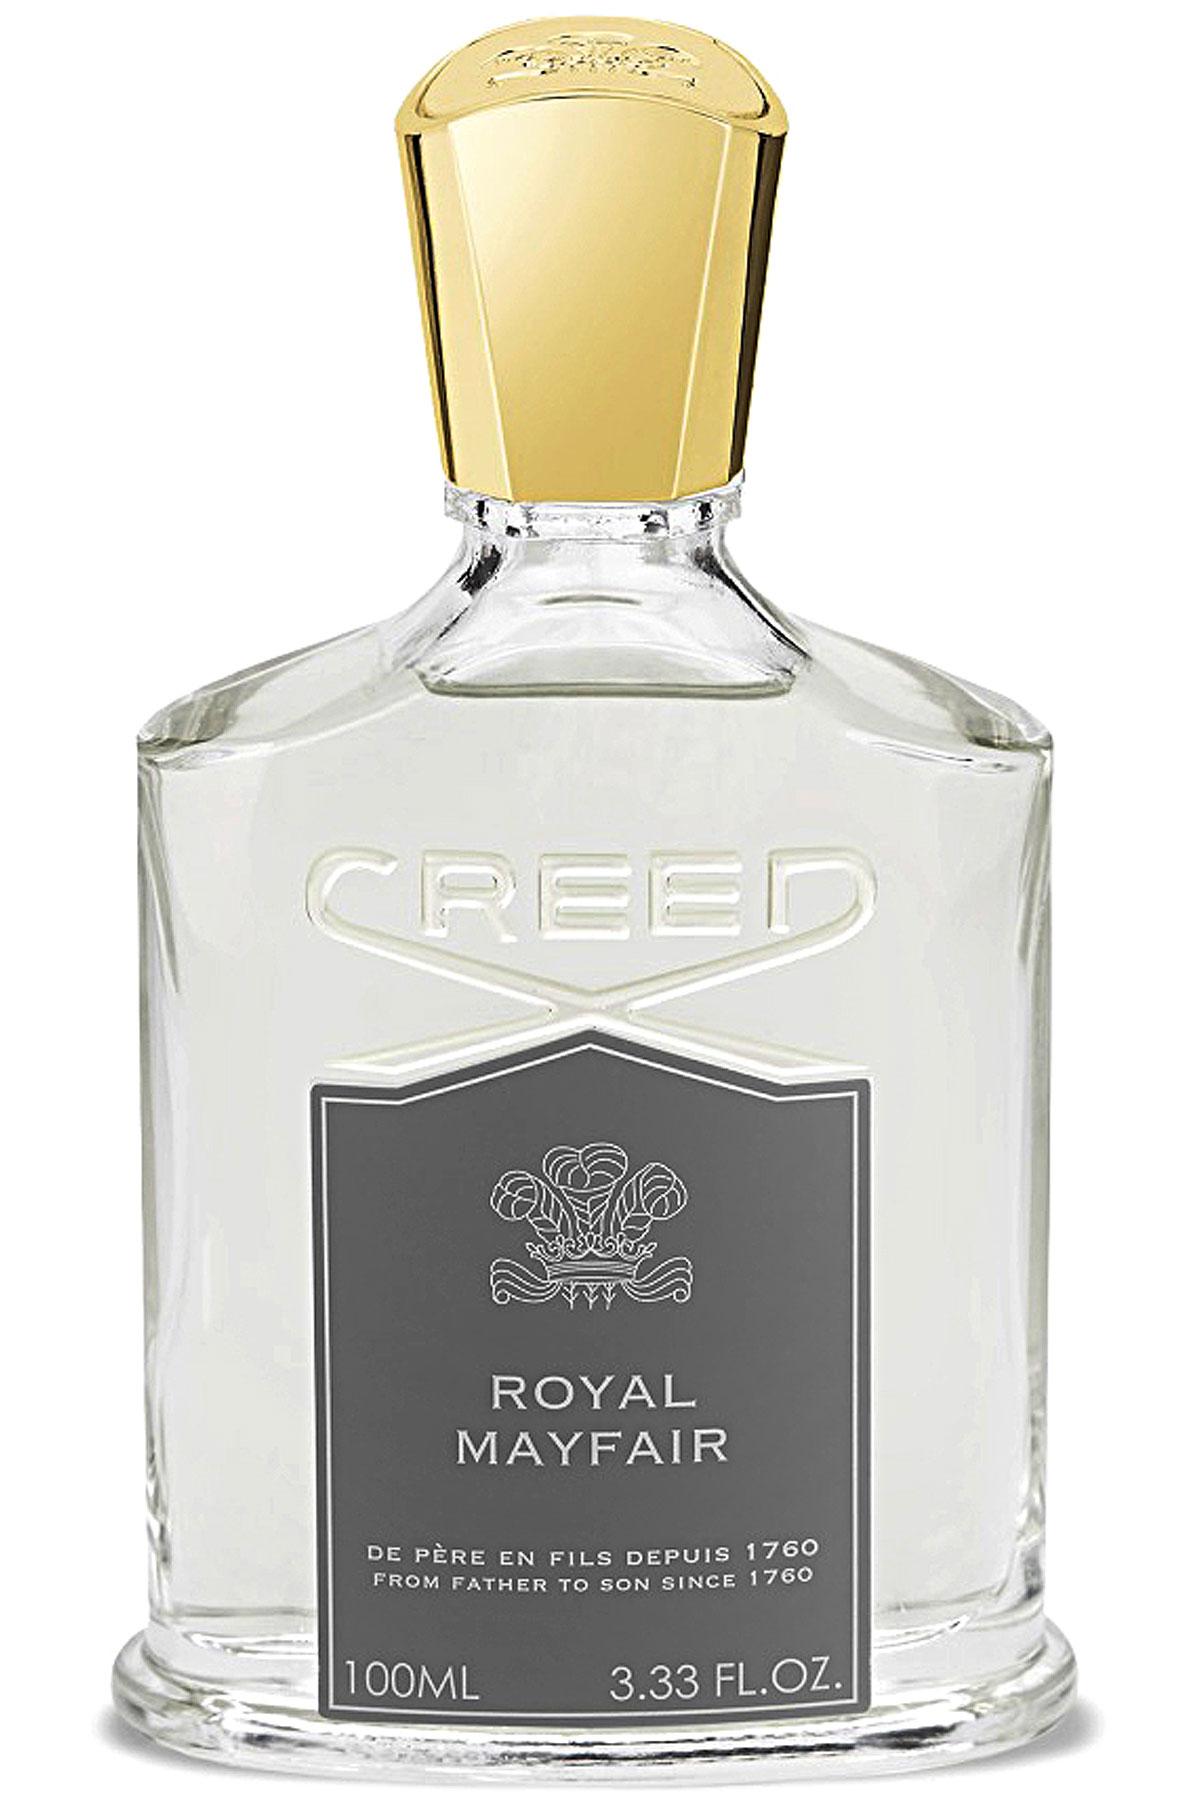 Creed Fragrances for Women, Royal Mayfair - Eau De Parfum - 100 Ml, 2019, 100 ml